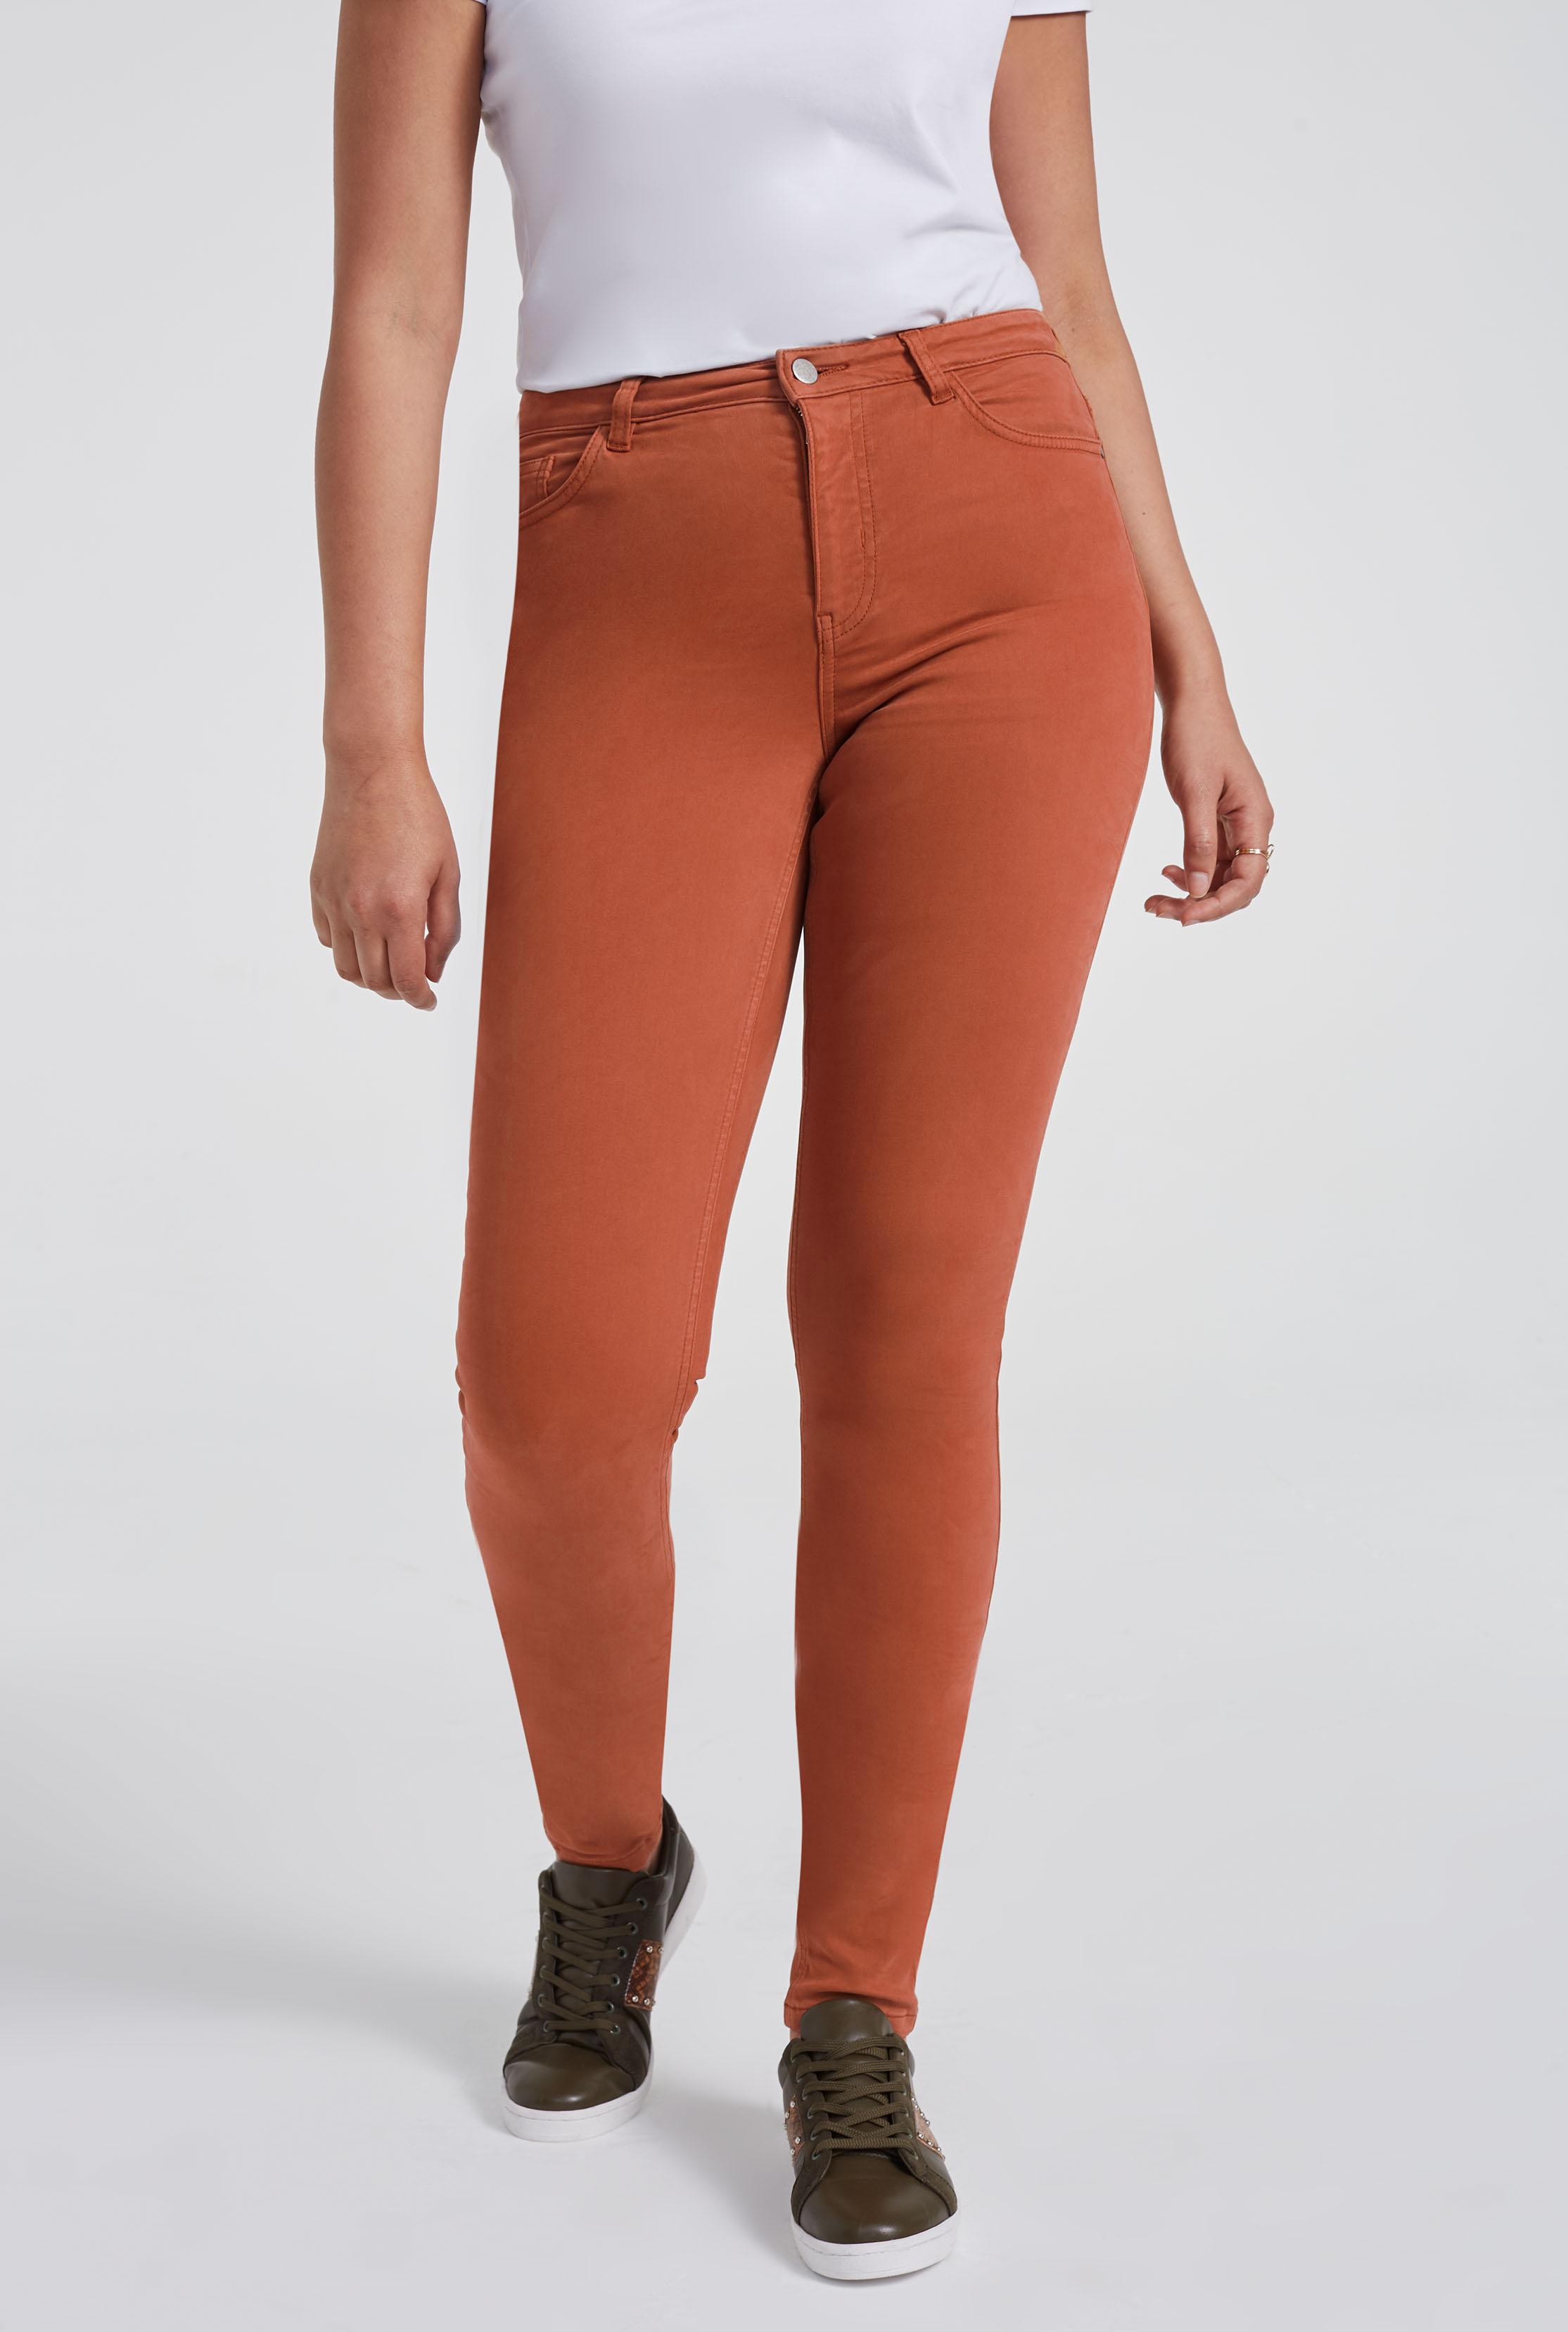 Supersoft Skinny Jean